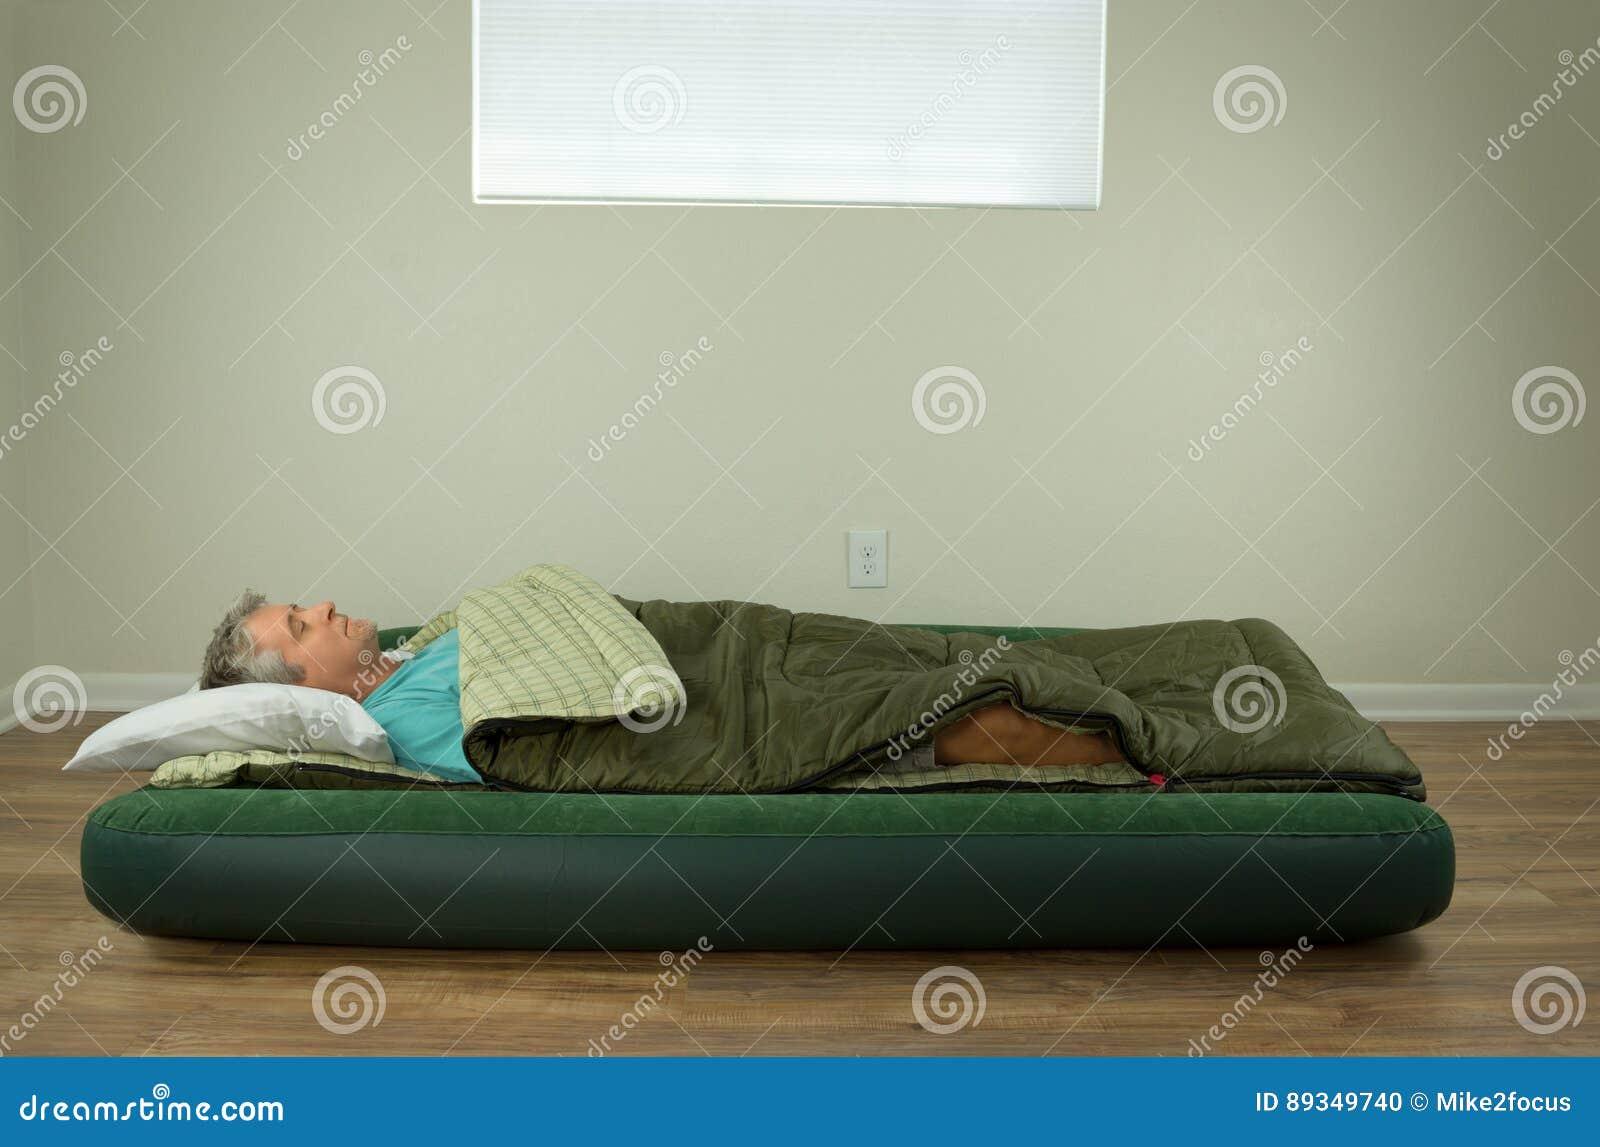 Man Comfortably Sleeping On Blow Up Air Mattress Bed In Sleeping